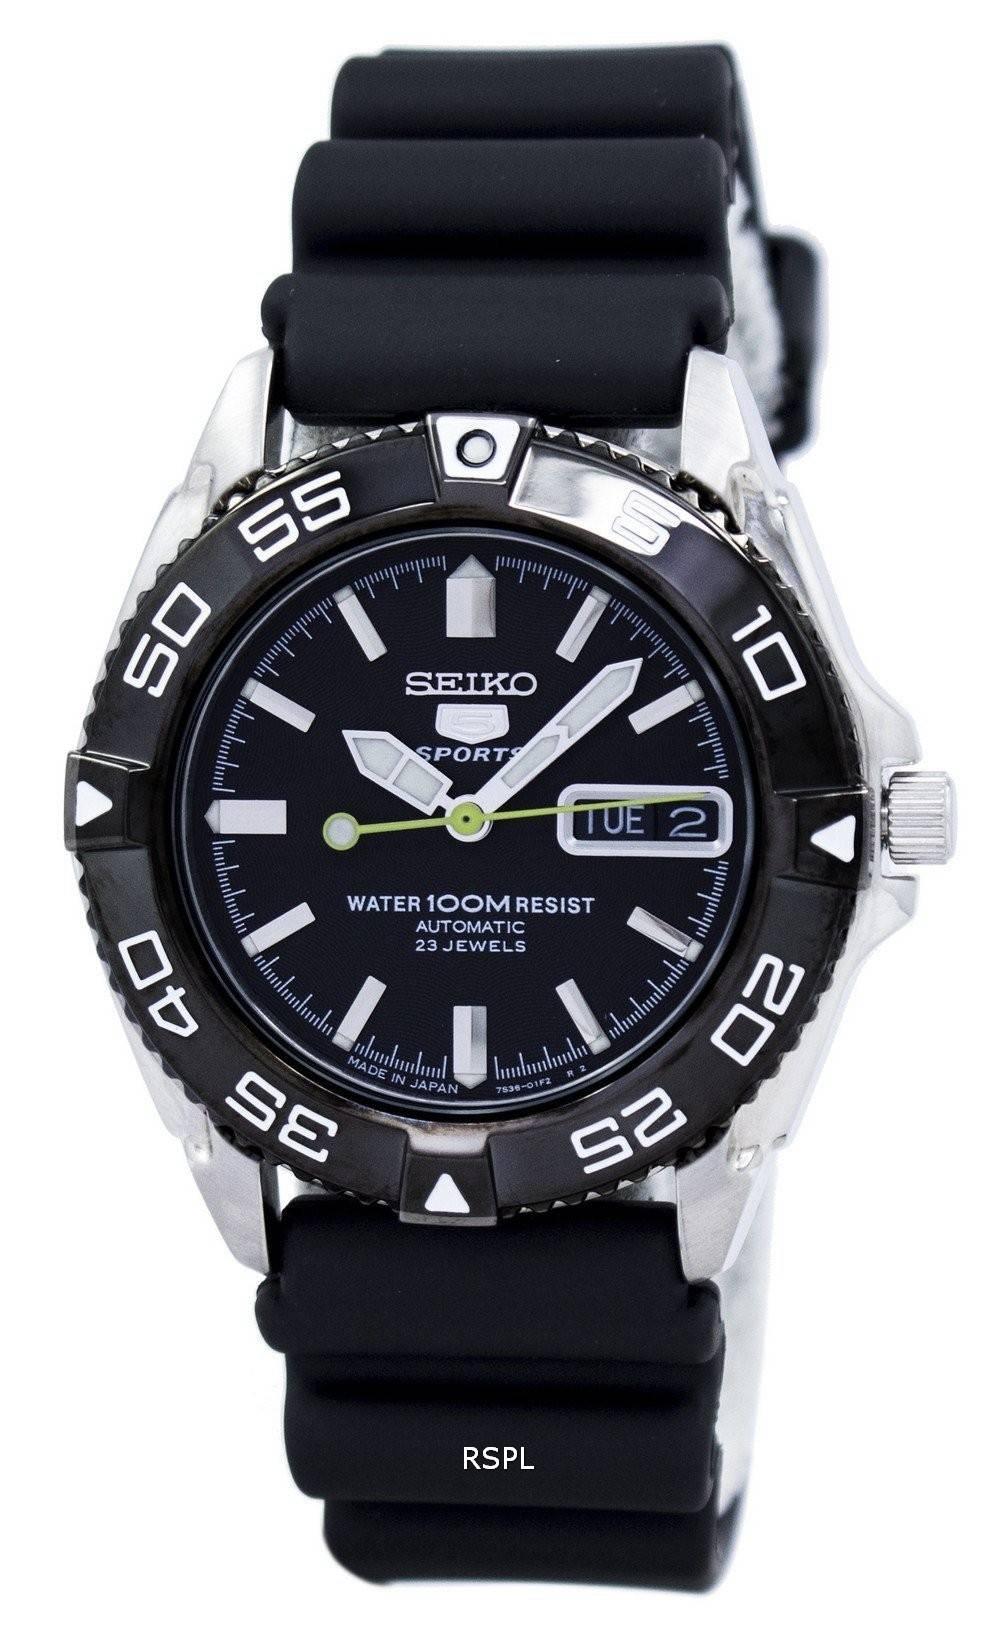 Seiko 5 Sports Automatic Japan Made 23 Jewels SNZB23J2 Mens Watch